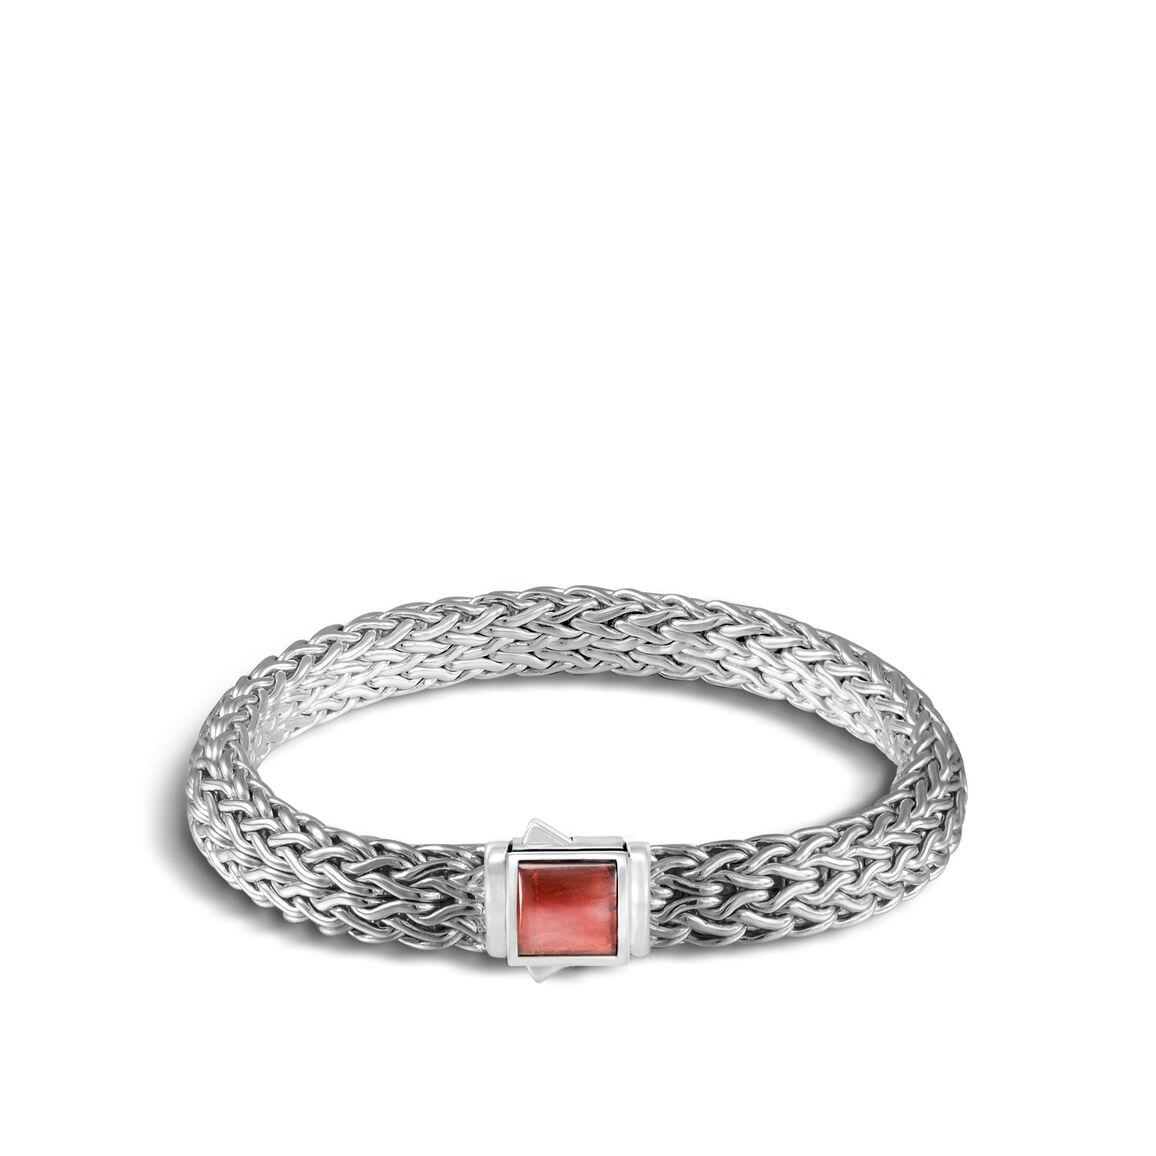 Reversible 7.5MM Bracelet, Silver with Gemstone